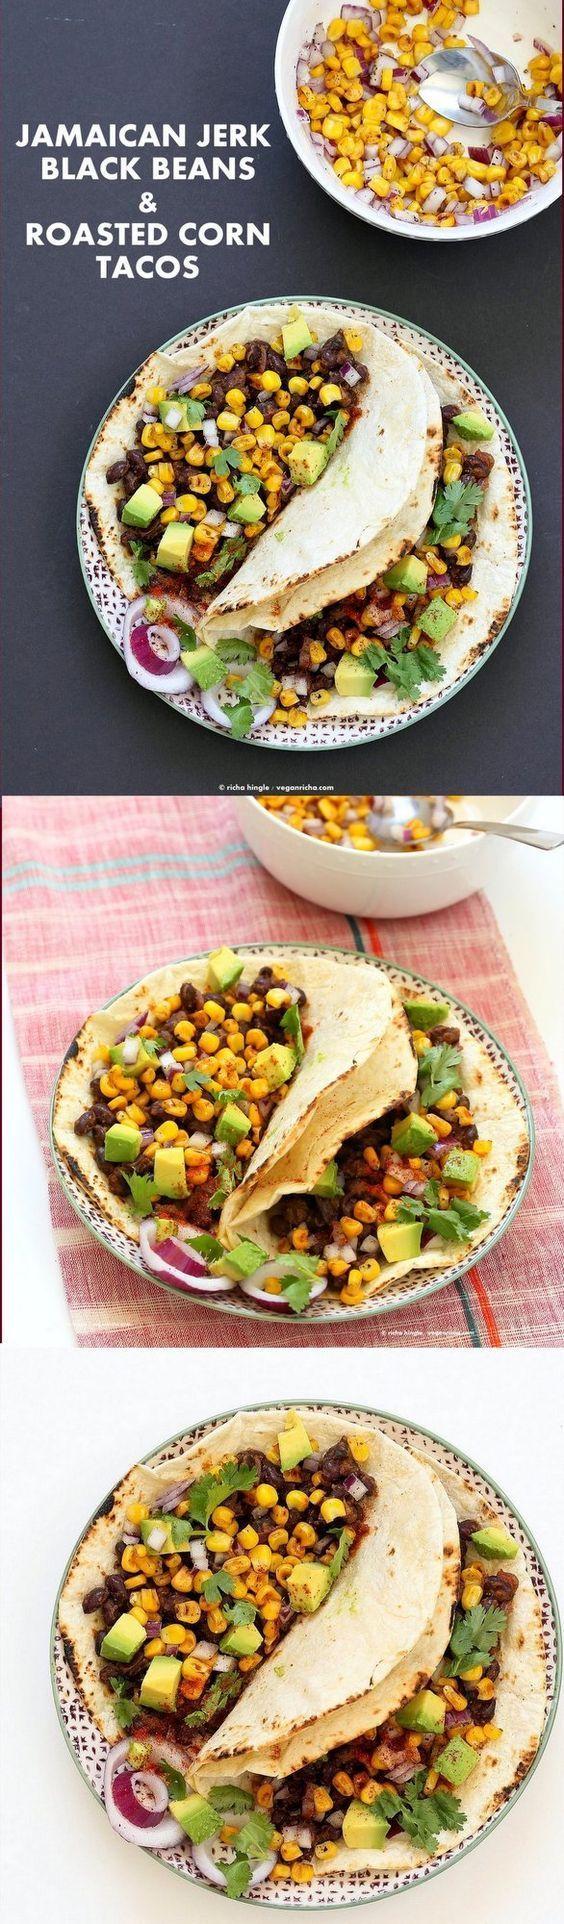 Jamaican Jerk Black Bean Tacos with Roasted Corn Salsa